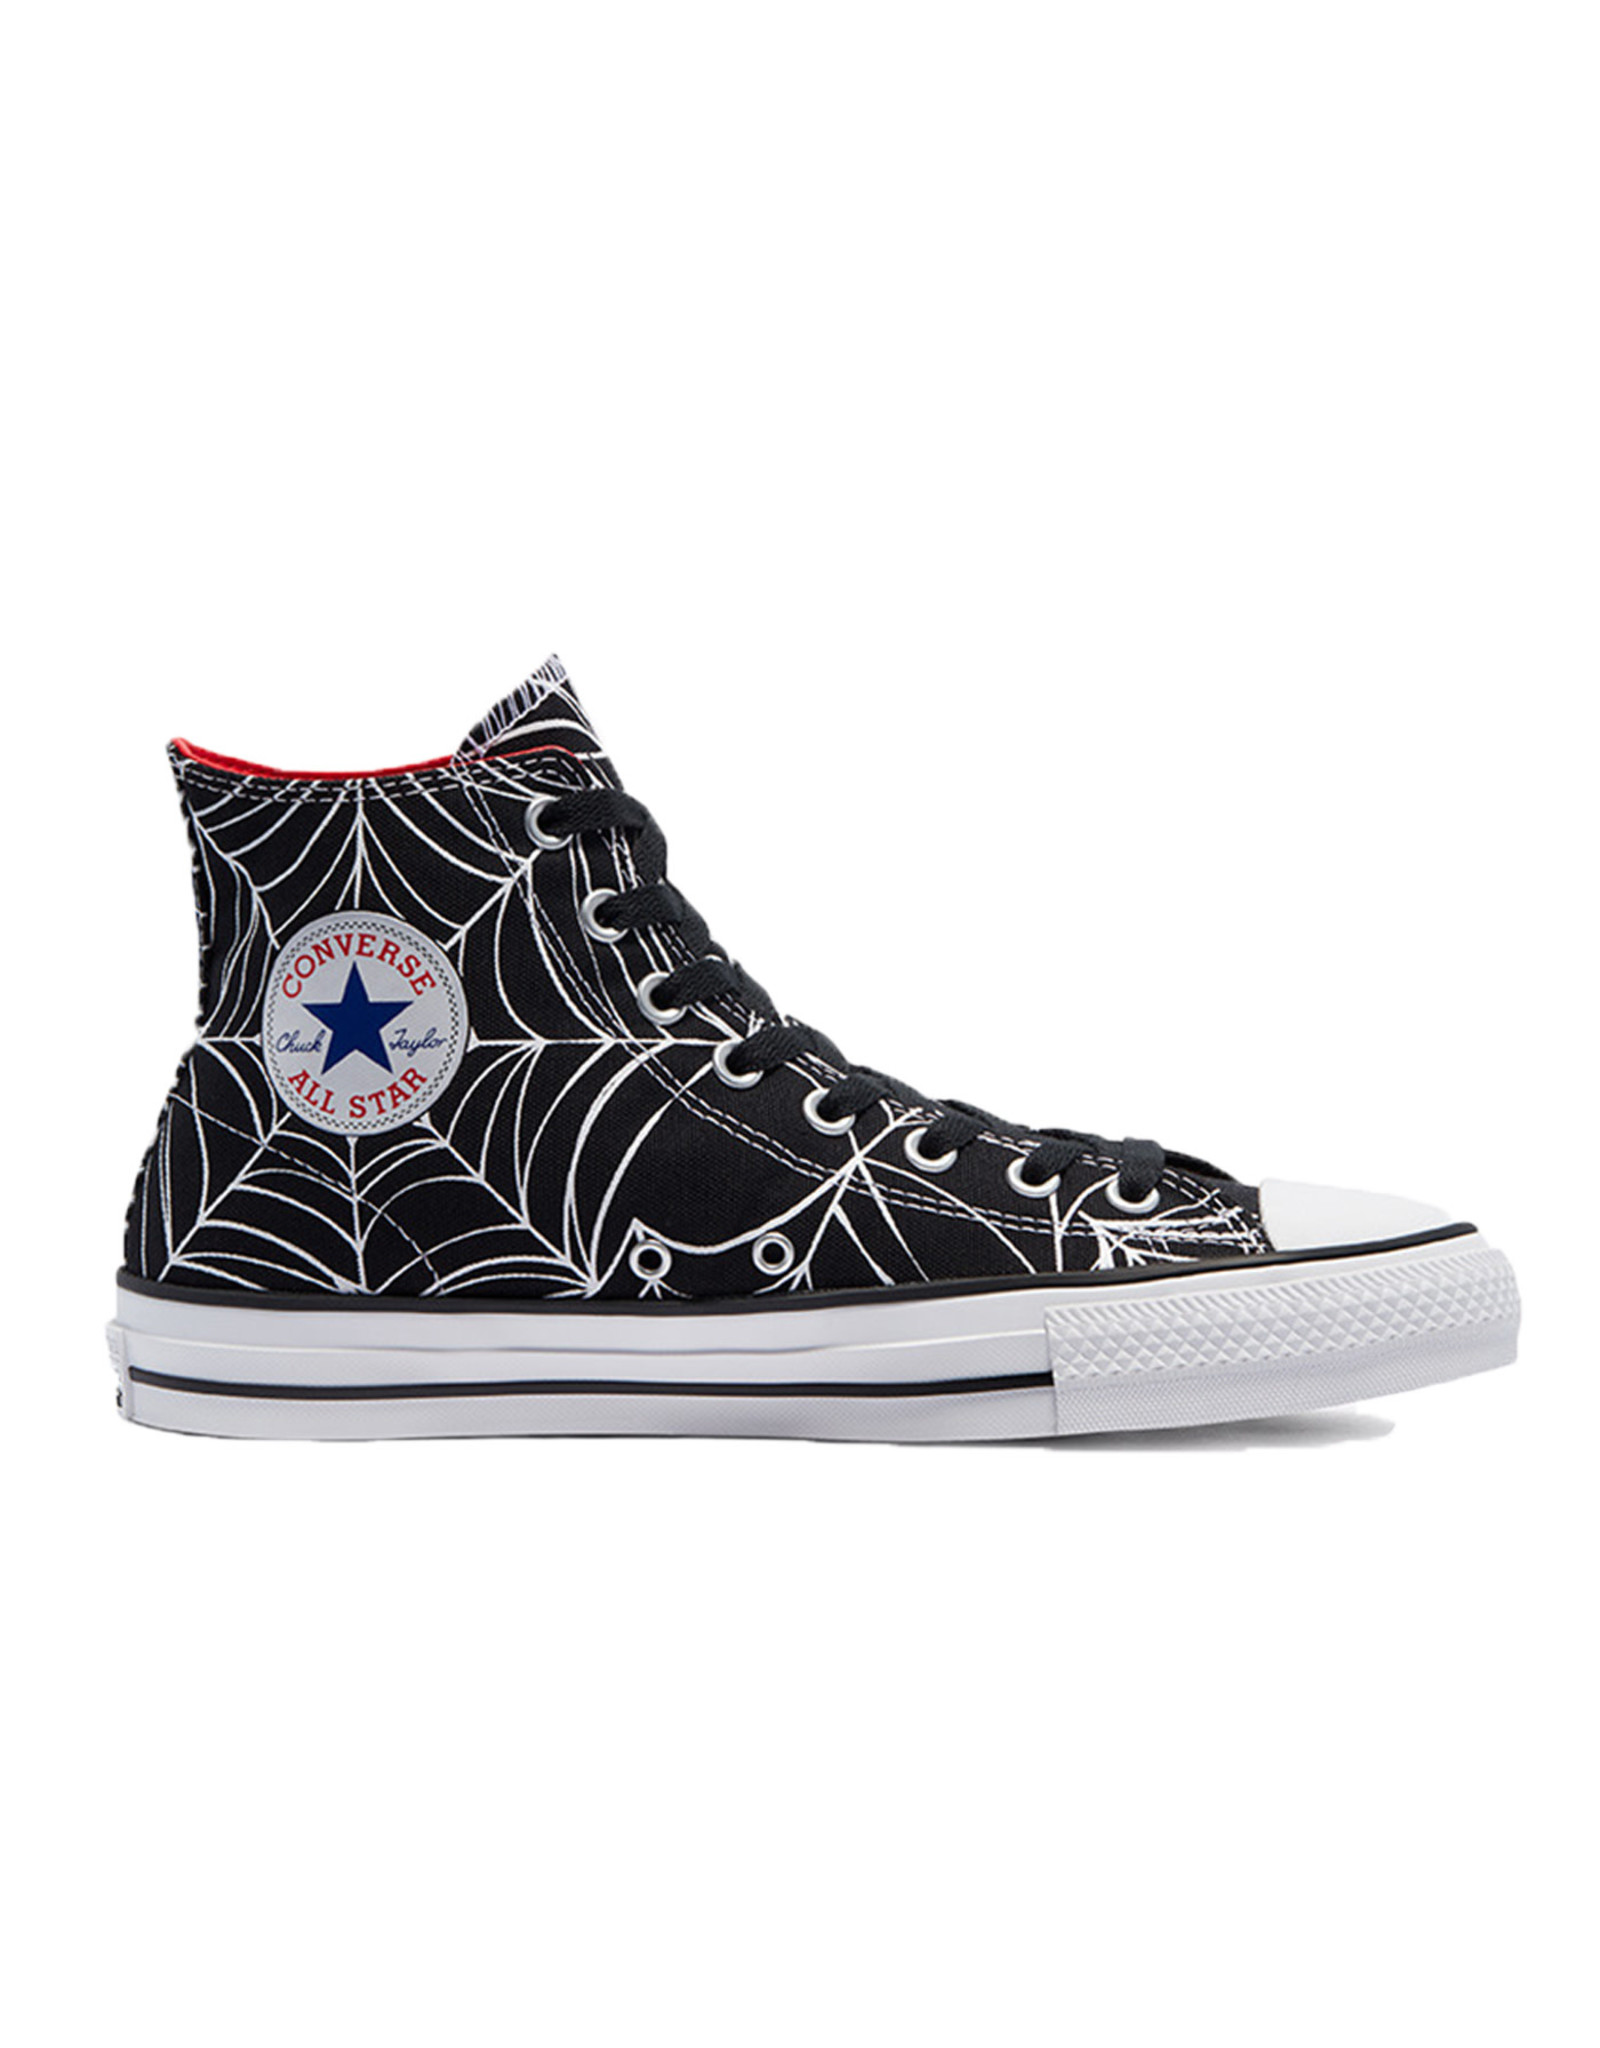 CONVERSE CHUCK TAYLOR ALL STAR PRO HI BLACK/UNIVERSITY RED/WHITE C188WEB-170938C